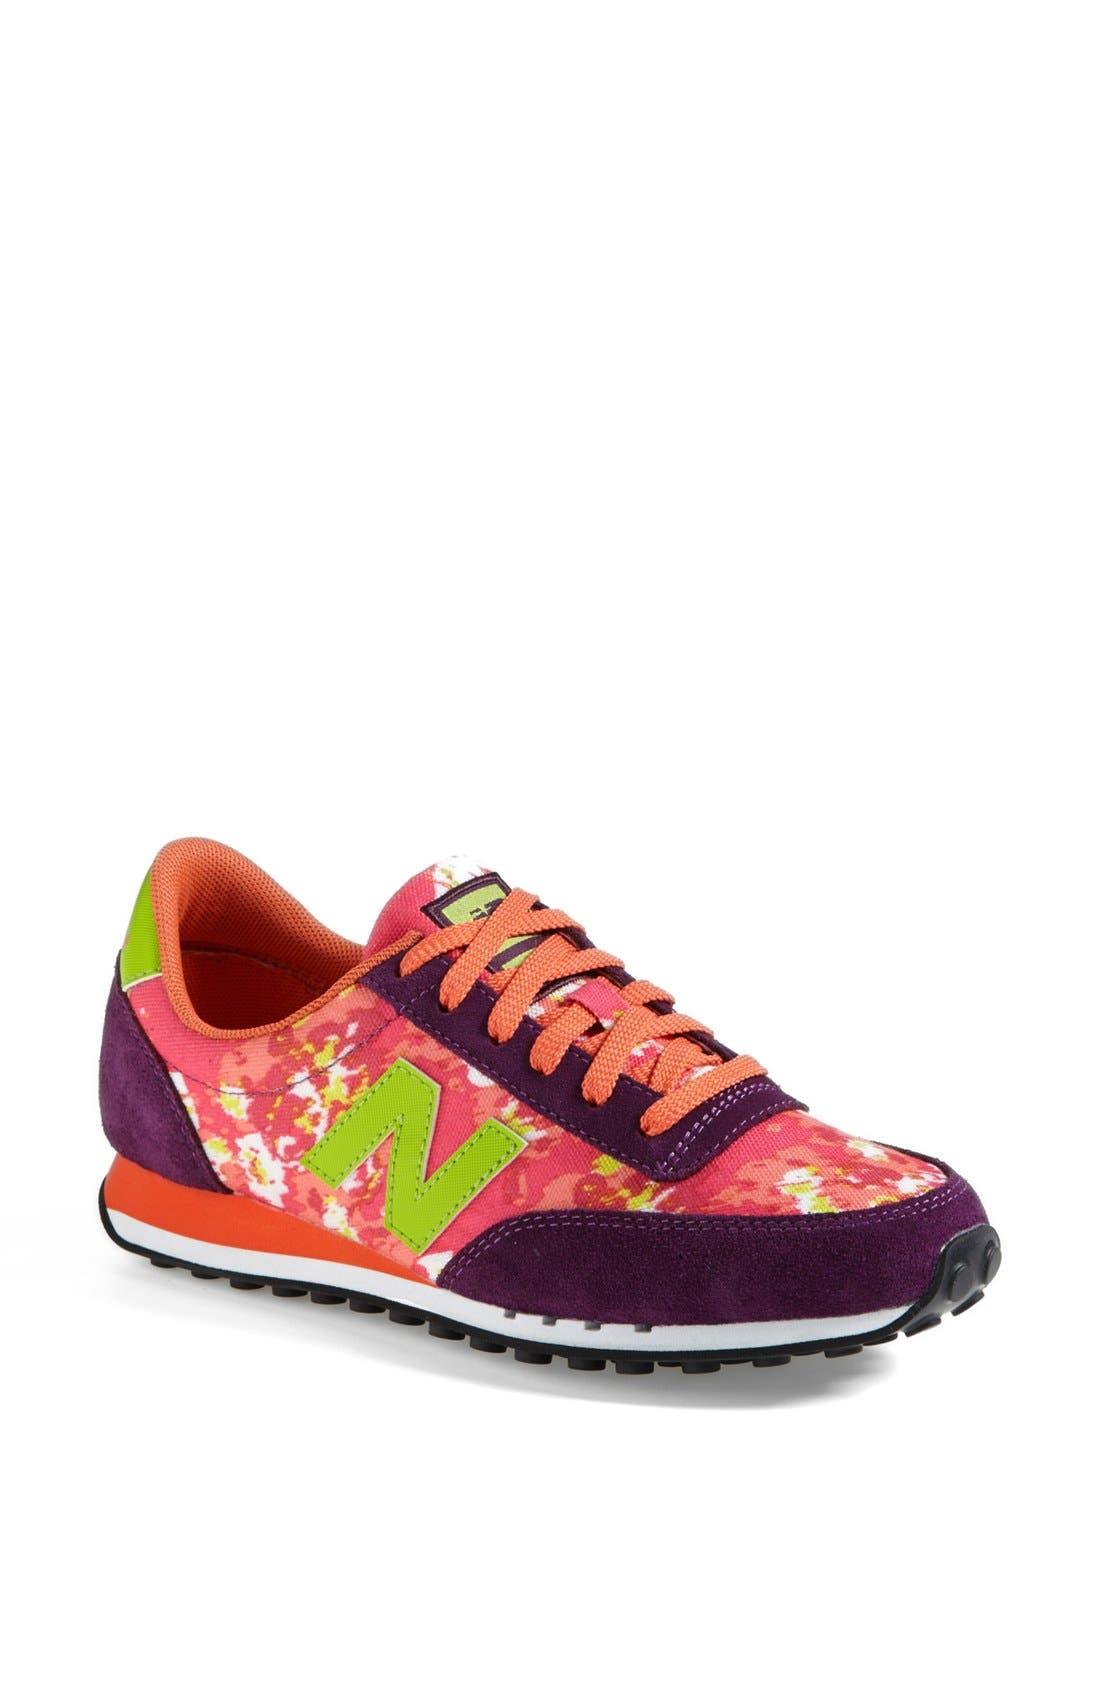 Main Image - New Balance '410 Floral Blur' Sneaker (Women)